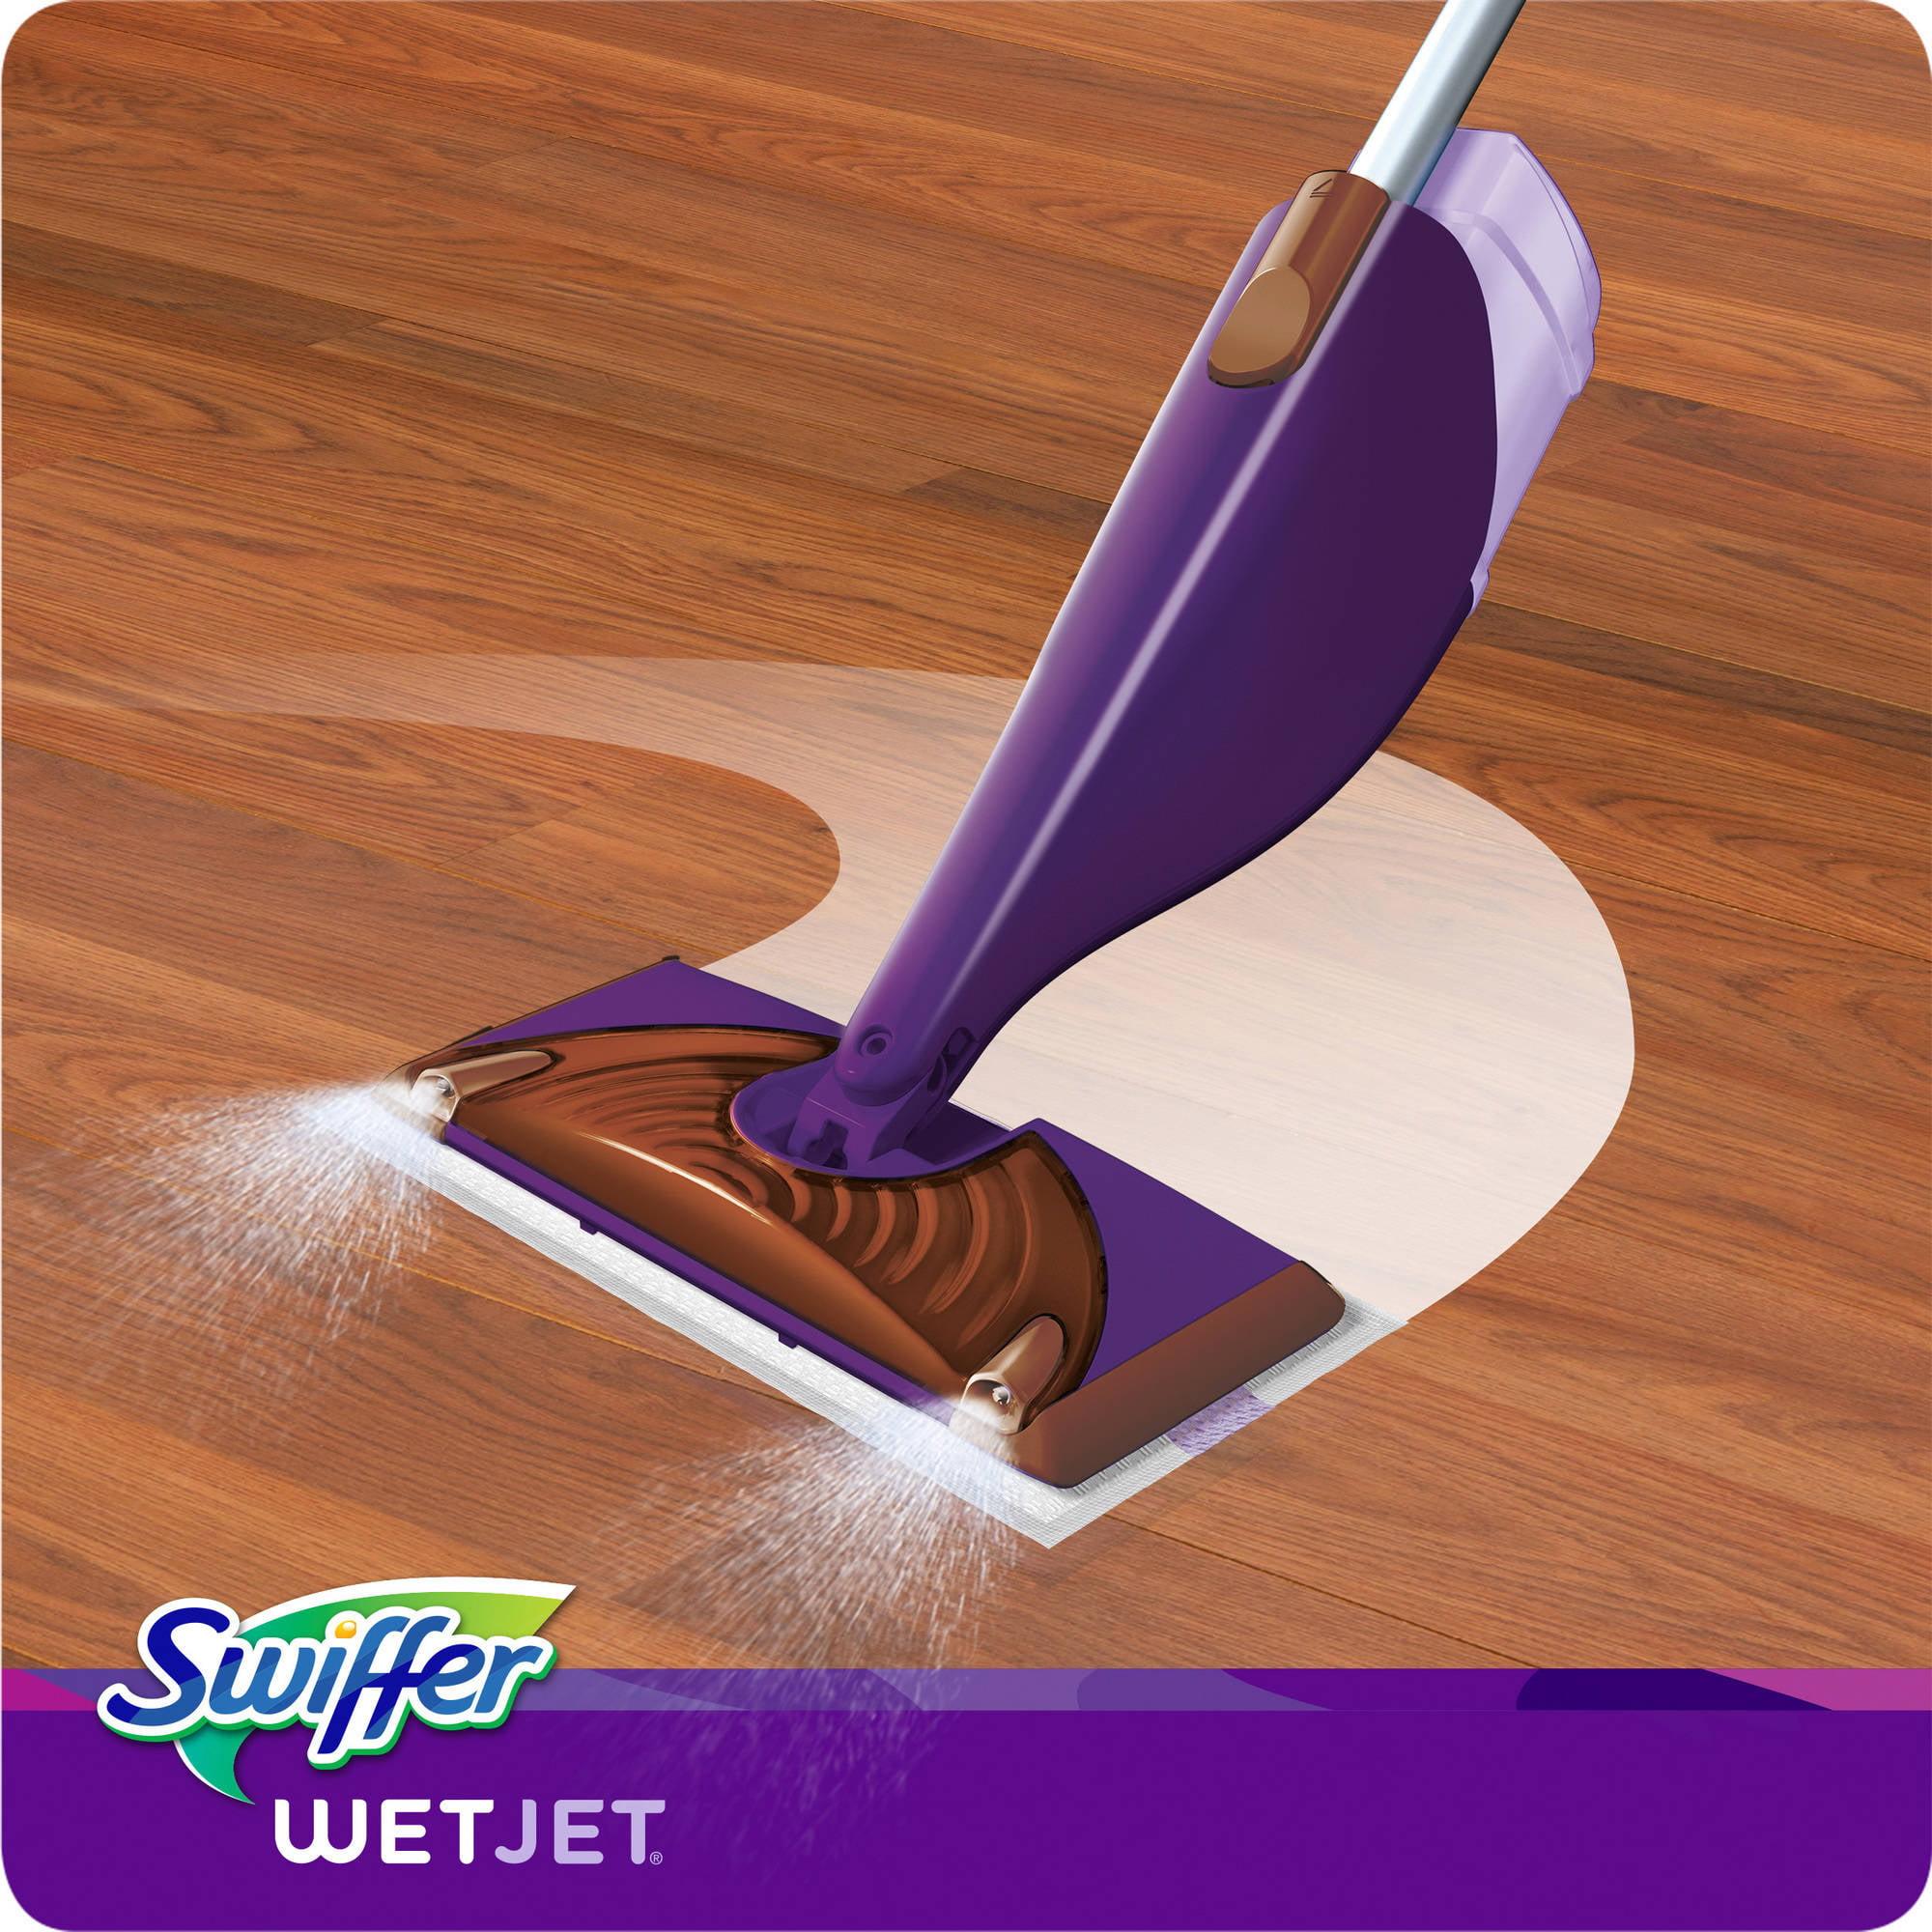 Swiffer wetjet wood floor cleaner - Swiffer Wetjet Wood Floor Cleaner 35